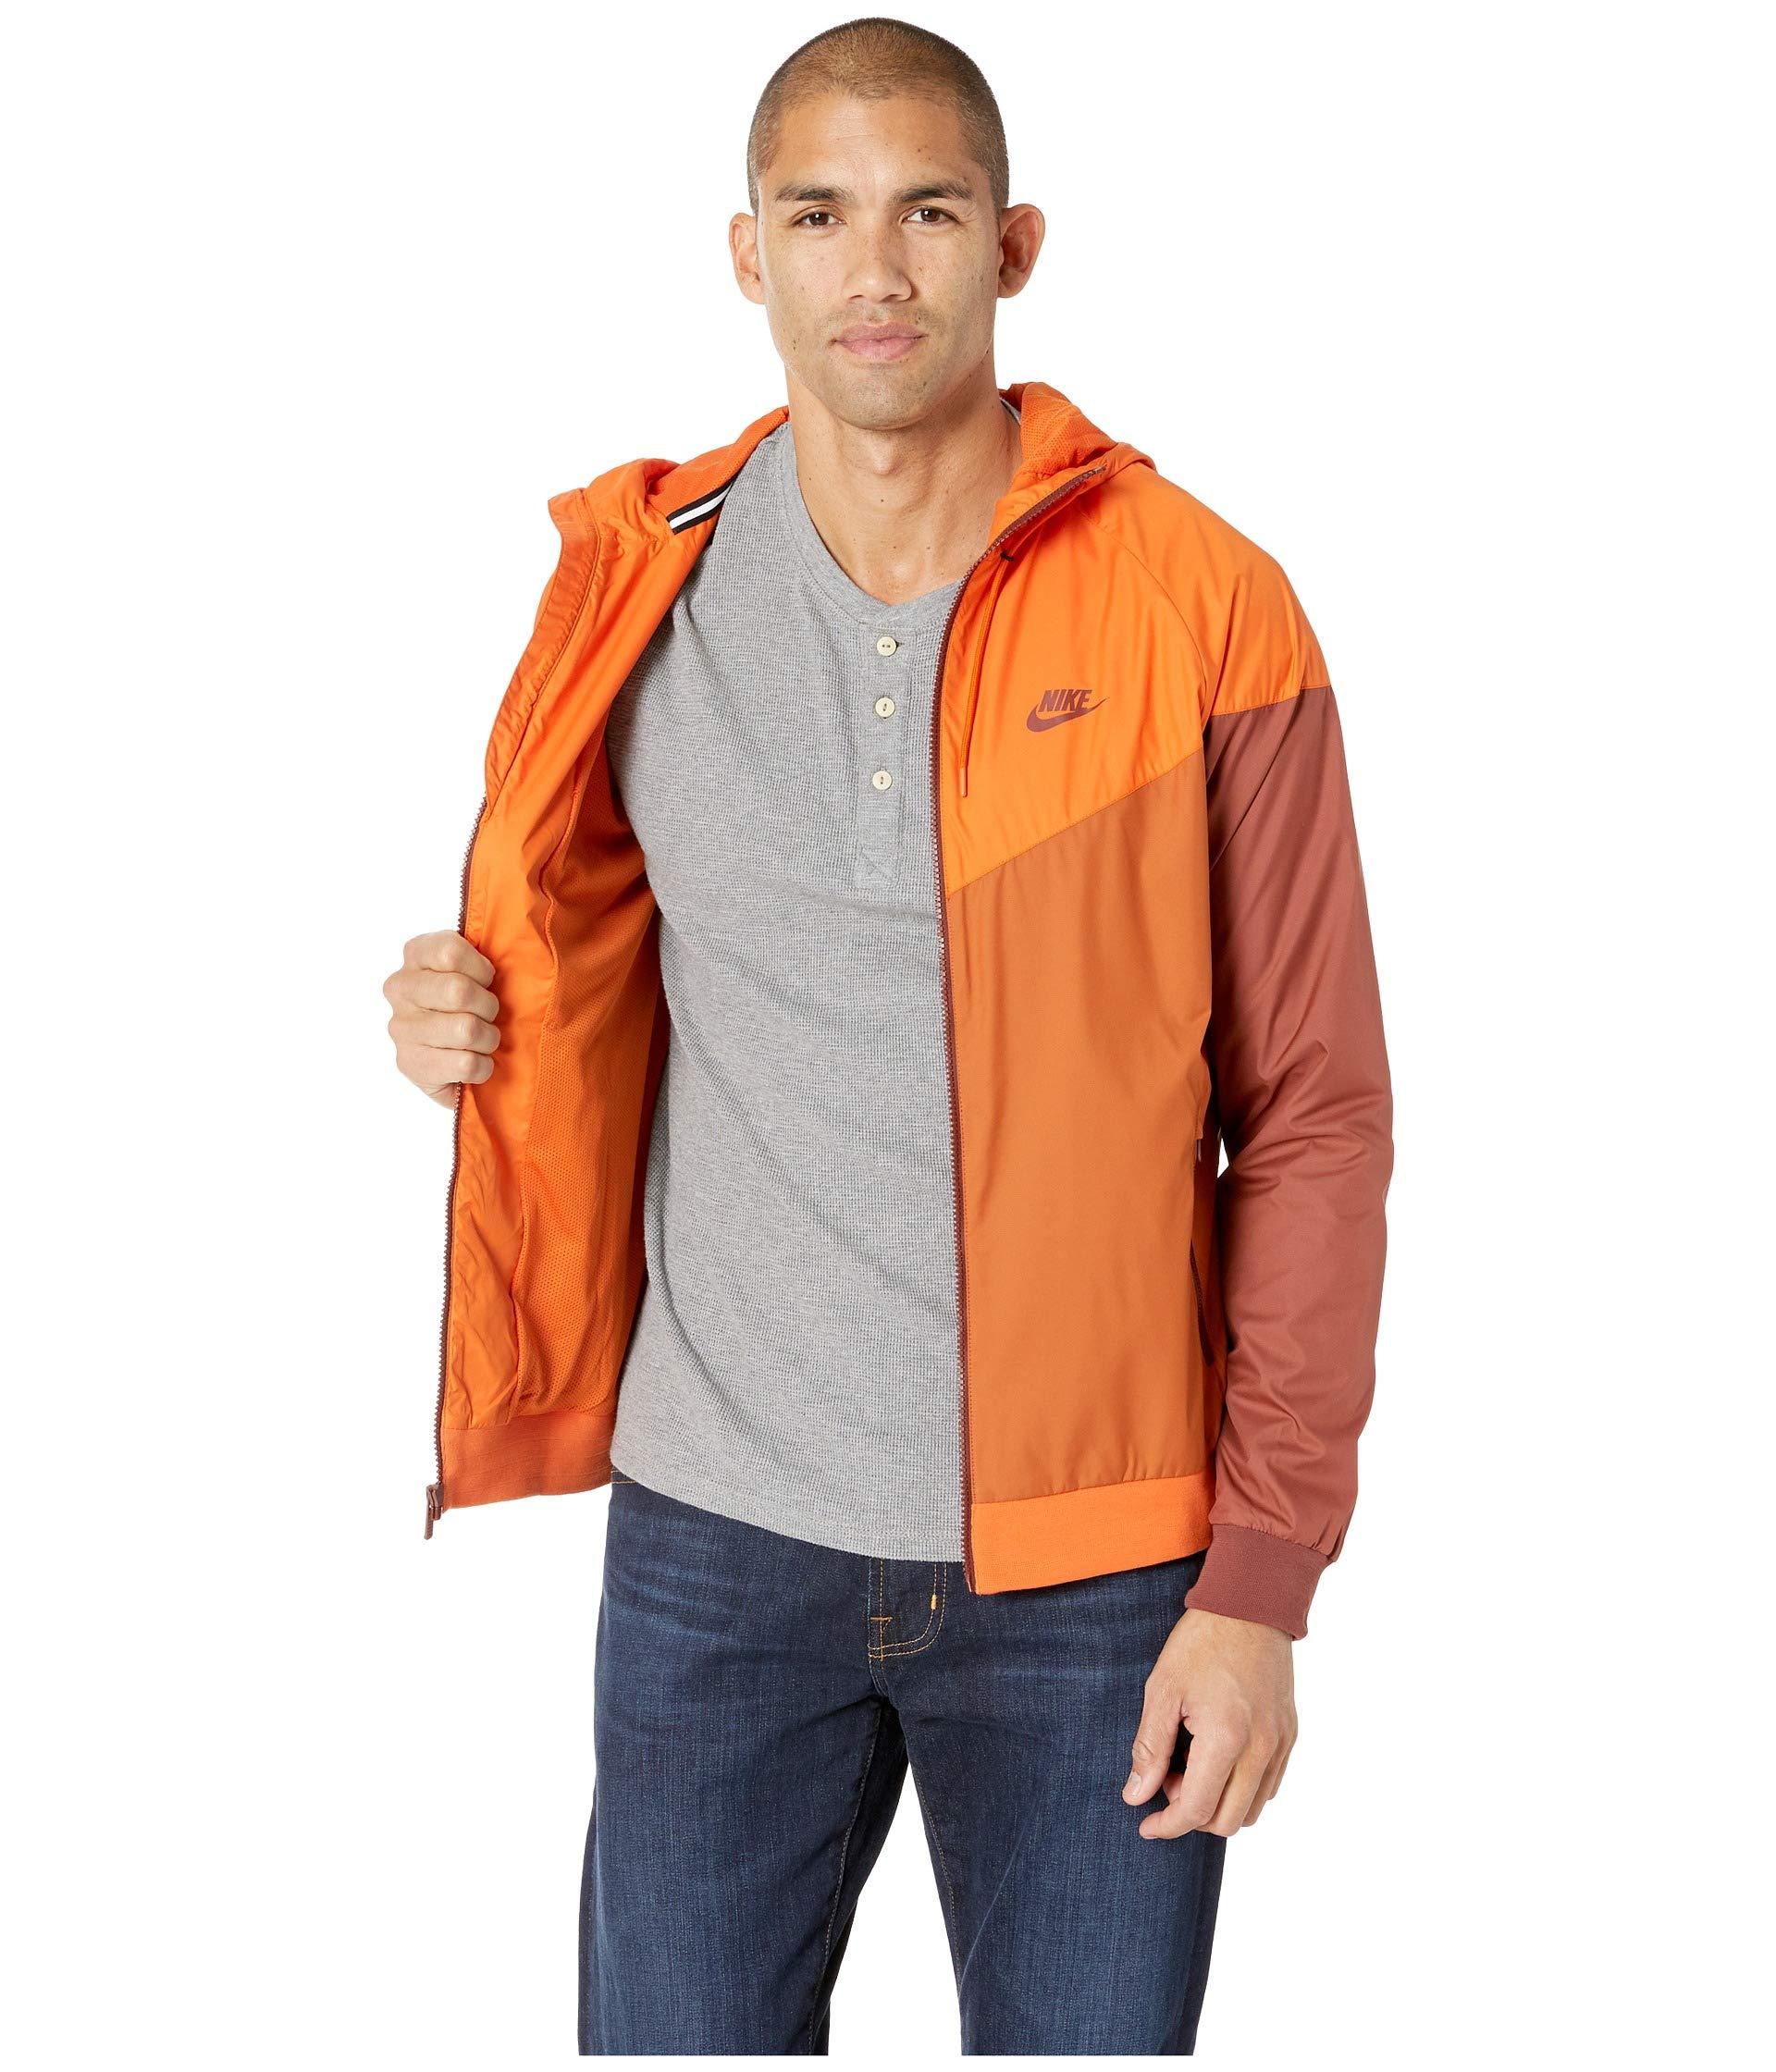 Nike Men's Windrunner Full Zip Jacket (Cmpfre Ornge/Dk Russet/Small) by Nike (Image #6)